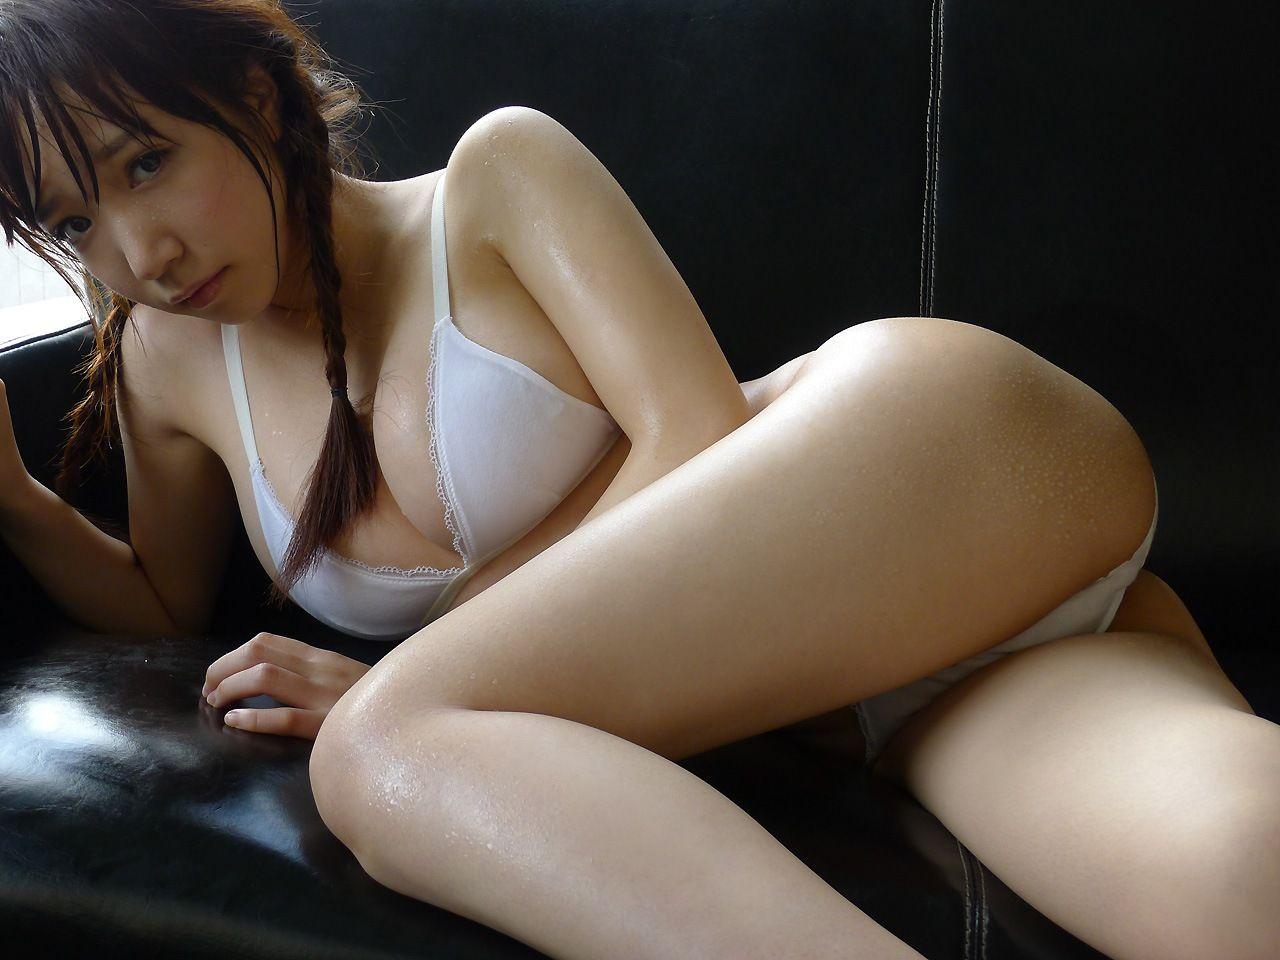 luxurtv.com